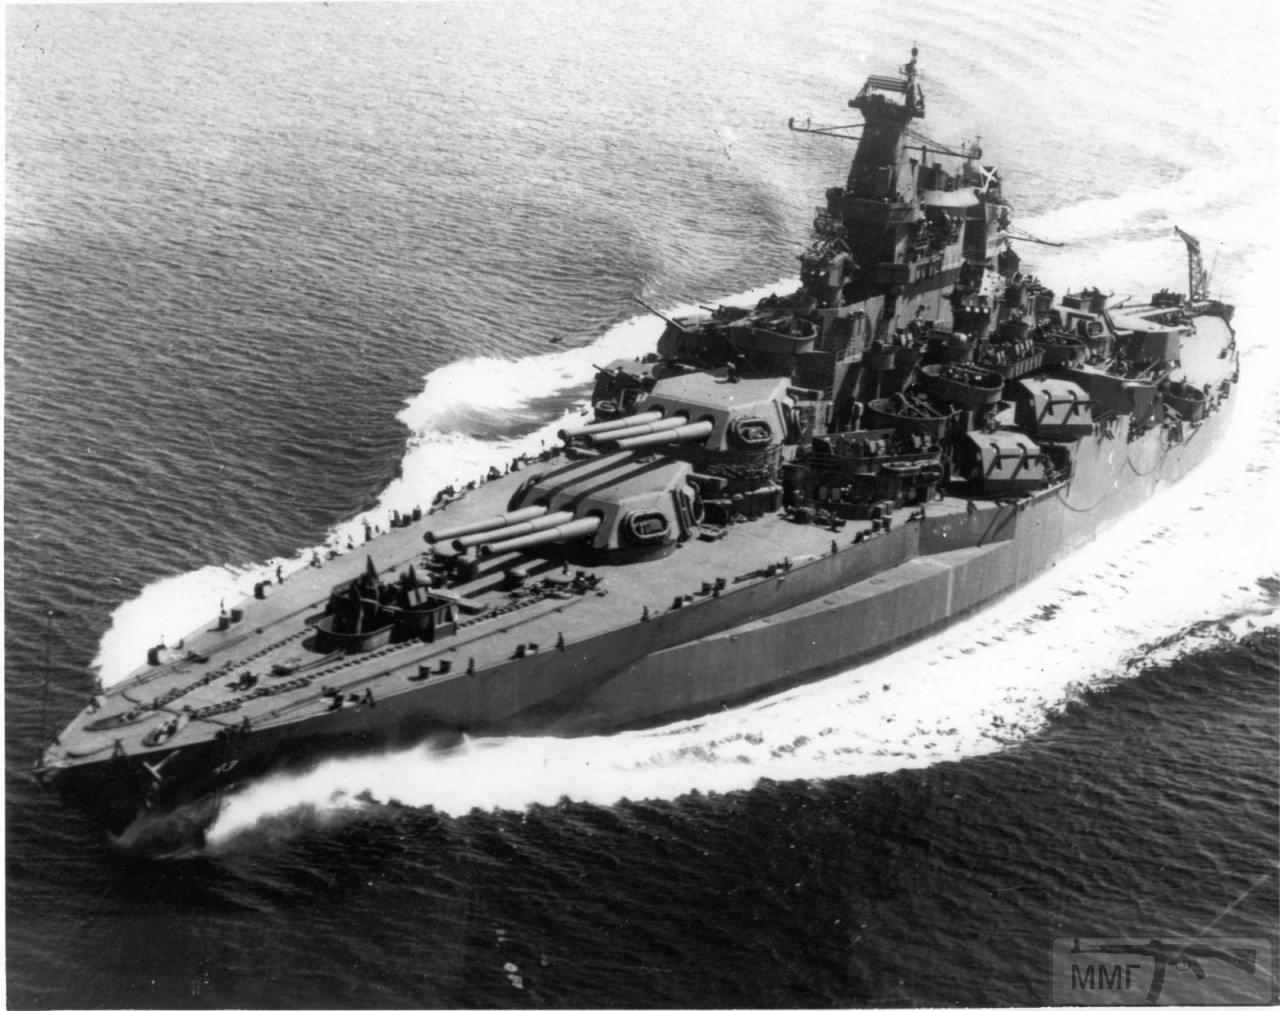 44486 - USS Tennessee (BB-43)